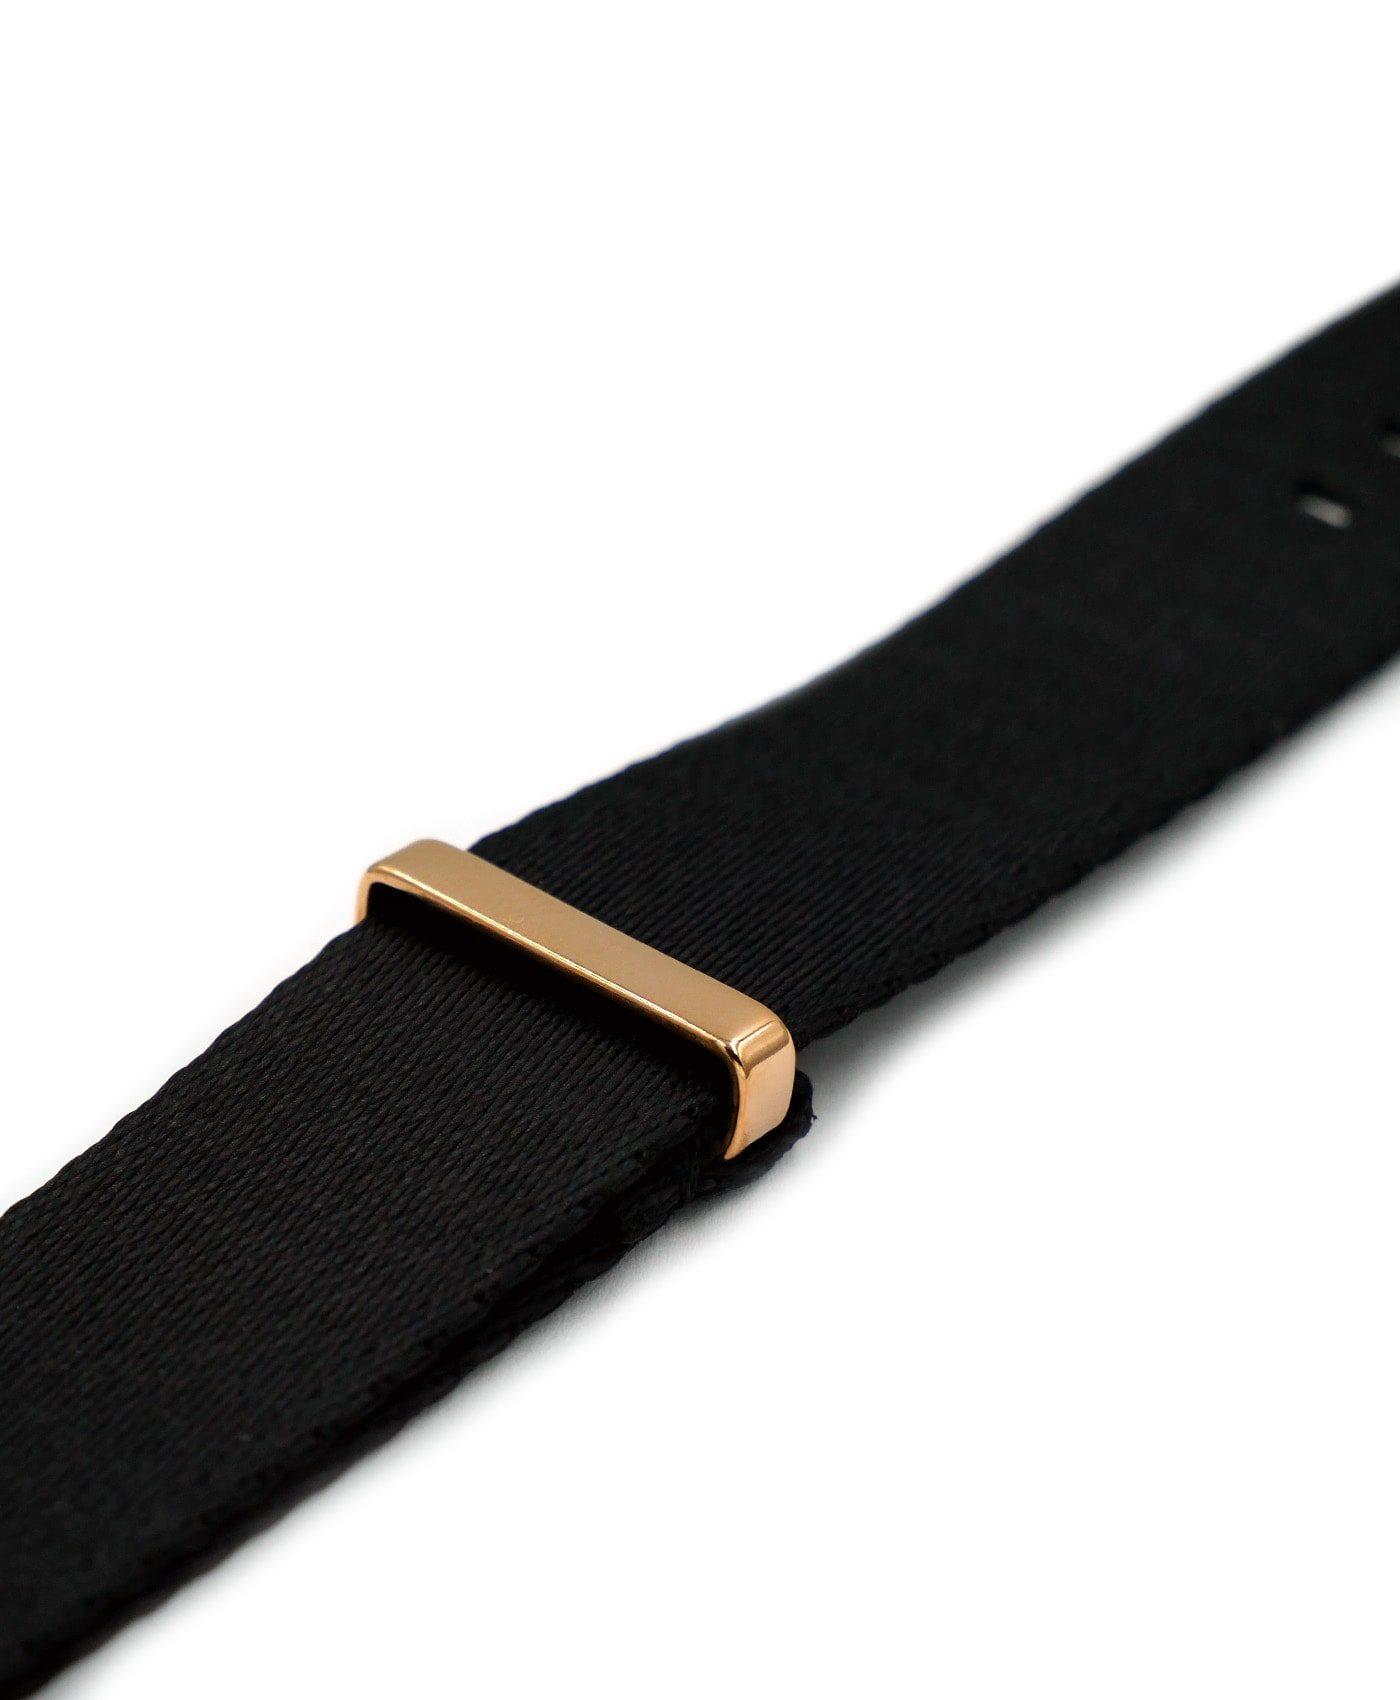 Watchbandit Premium rose gold NATO strap side keeper